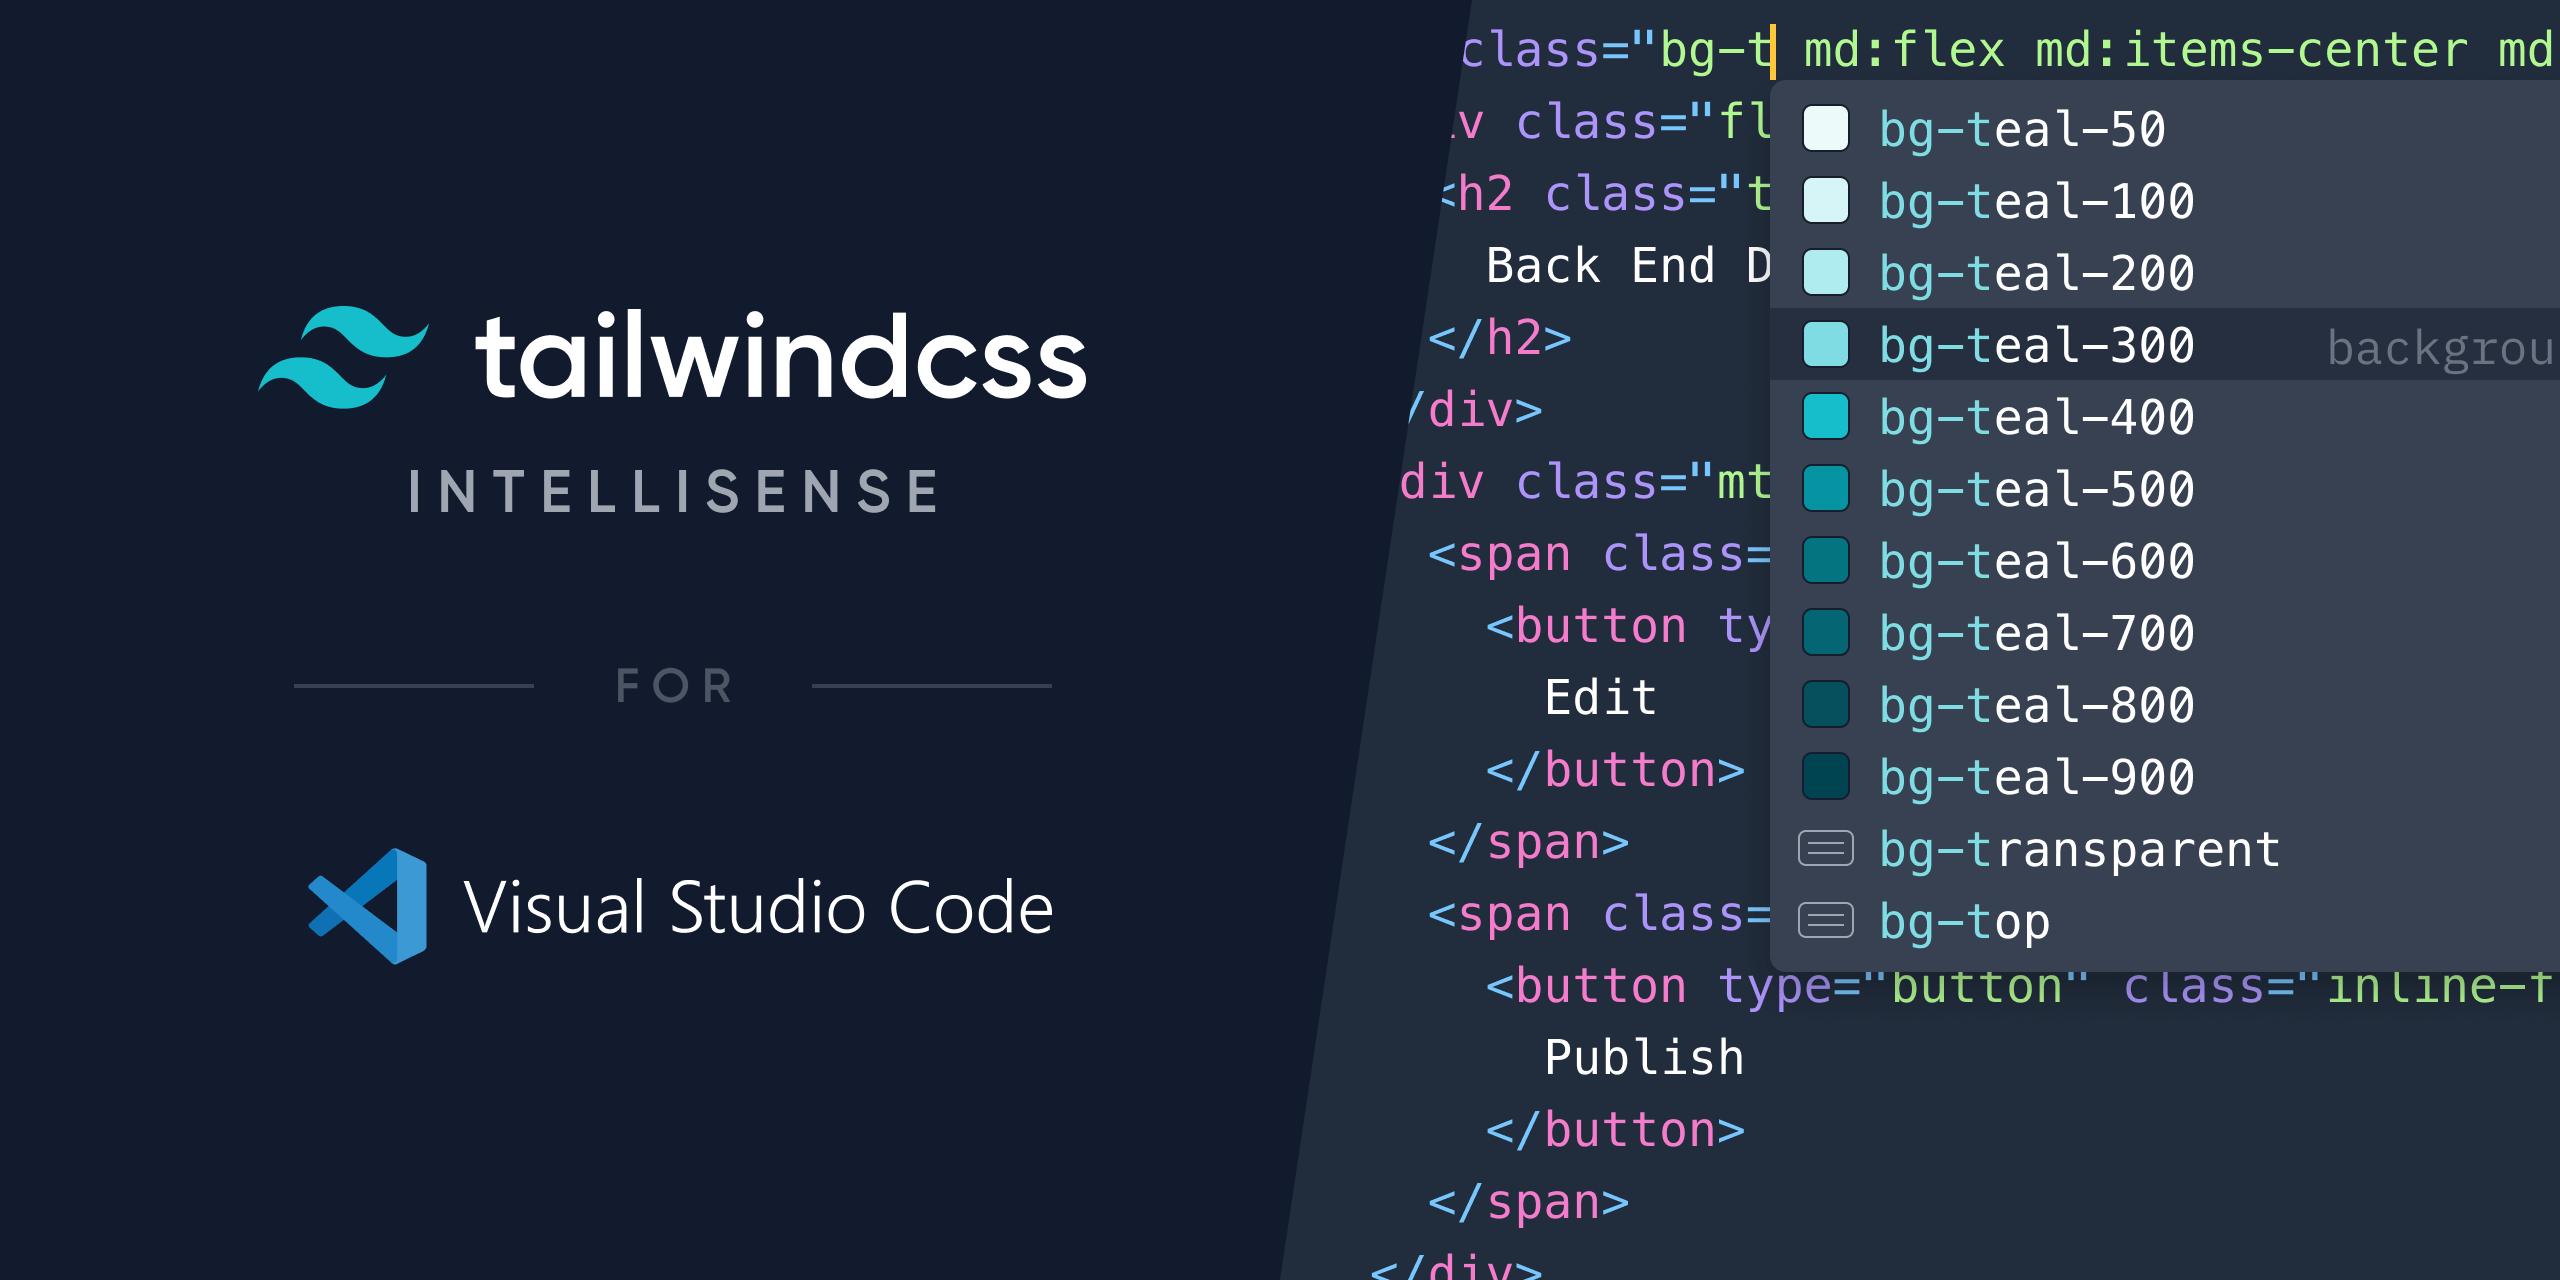 Tailwind CSS IntelliSense Image